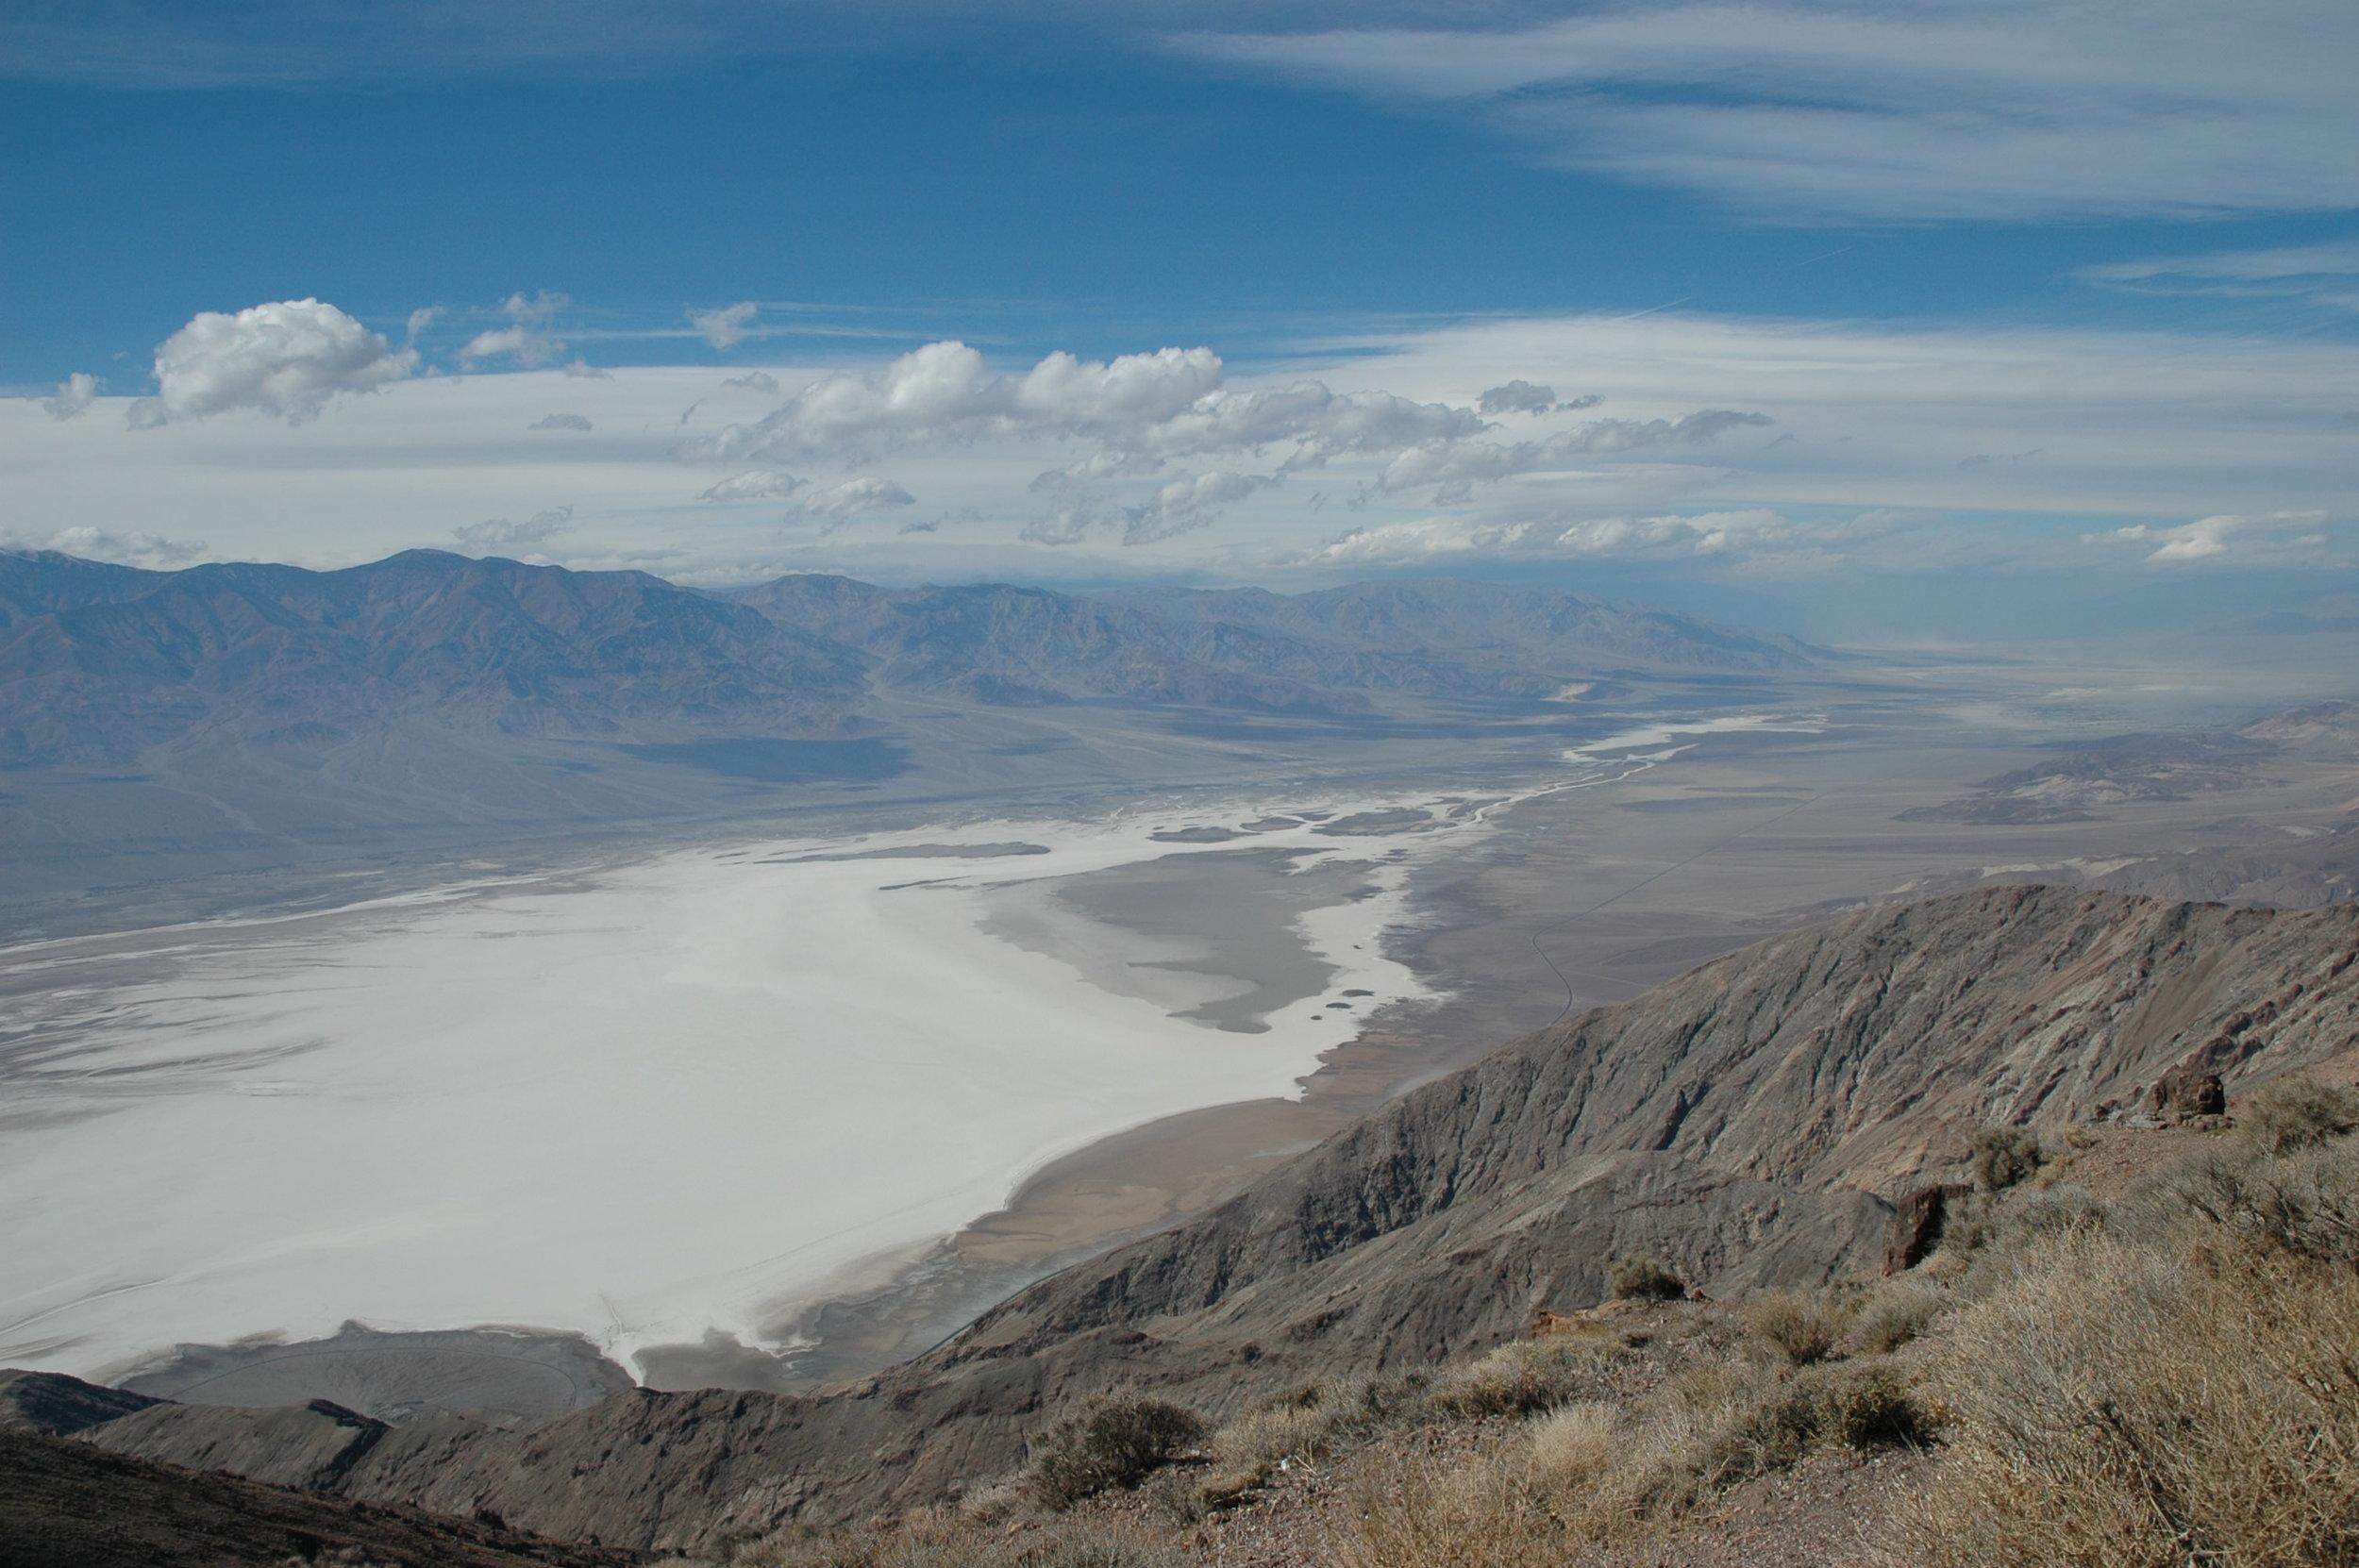 Dante's View, February 2007